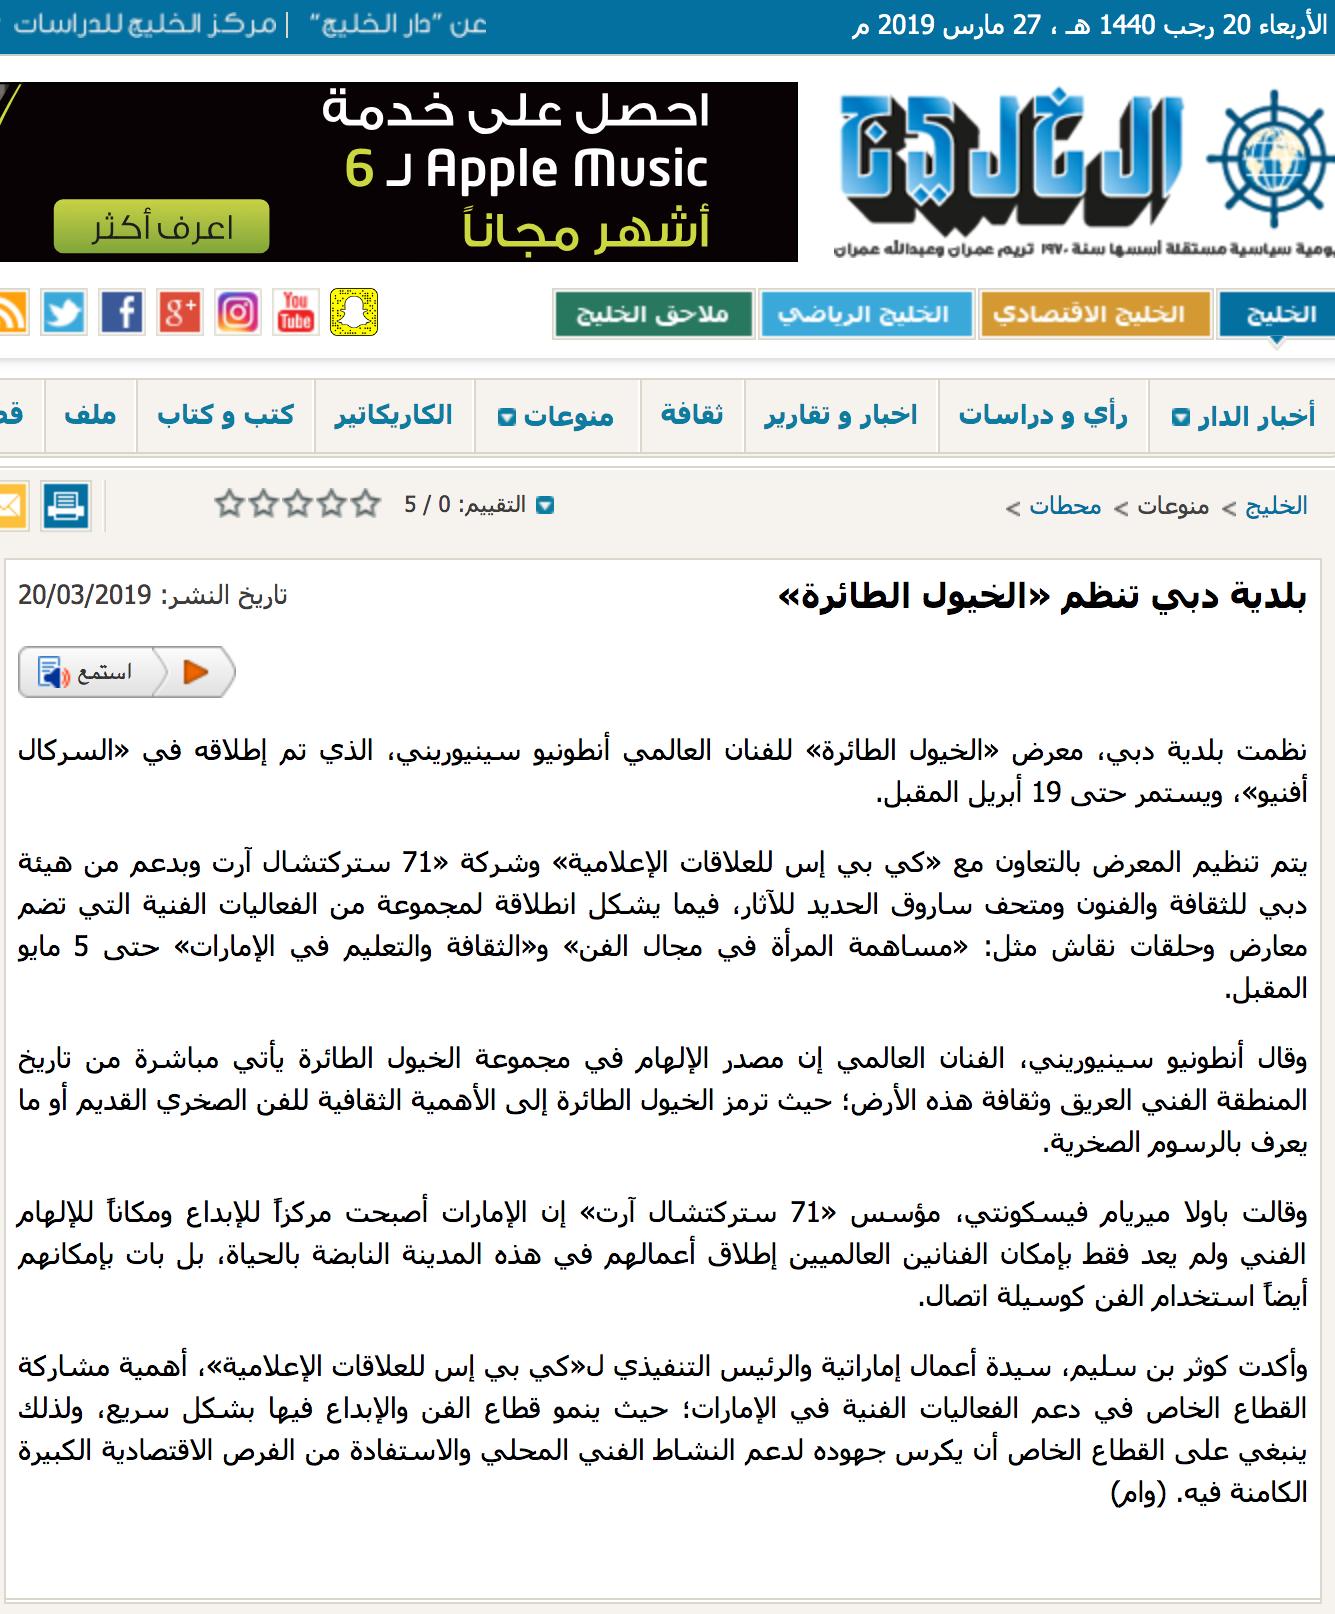 FireShot Capture 005 - بلدية دبي تنظم «الخيول الطائرة» - www.alkhaleej.ae.png